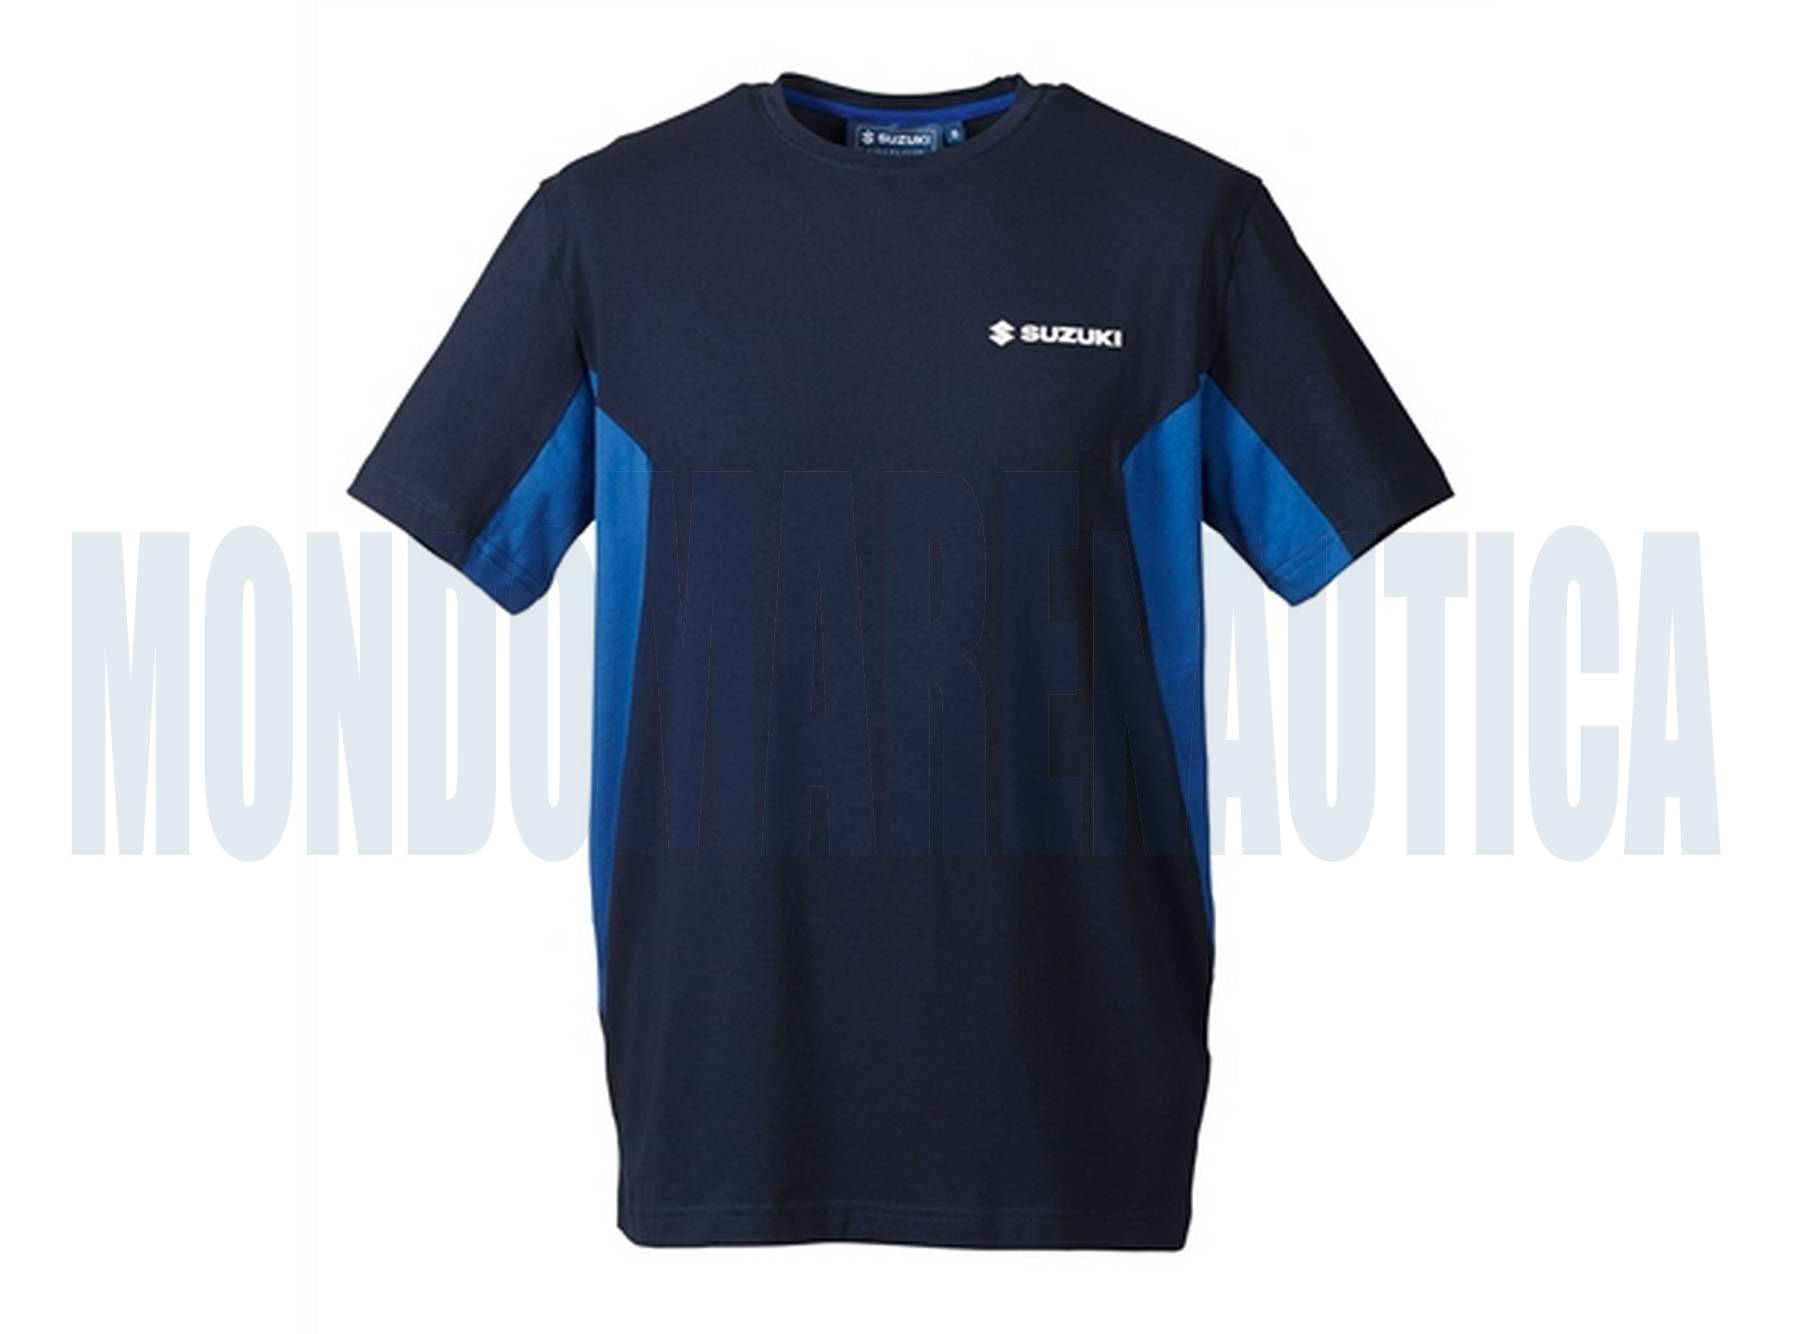 t shirt suzuki team blue in vendita t shirt accessori e gadget suzuki vendita t shirt suzuki. Black Bedroom Furniture Sets. Home Design Ideas